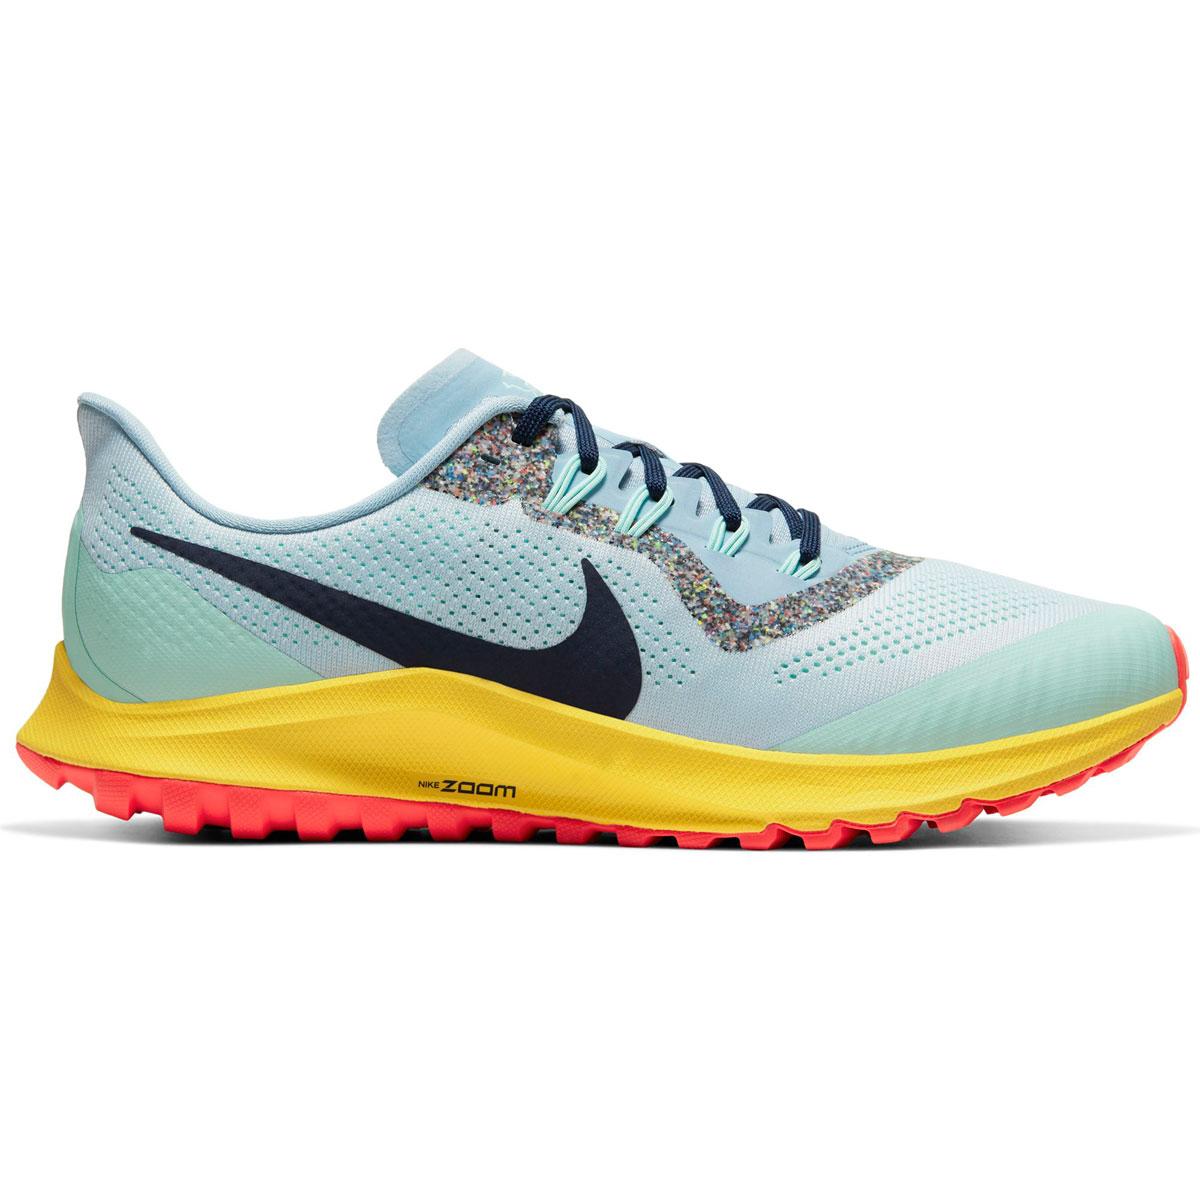 Men's Nike Air Zoom Pegasus 36 Trail Running Shoe - Color: Aura/Blackened Blue/Light Armory (Regular Width) - Size: 6, Aura/Blackened Blue/Light Armory, large, image 1